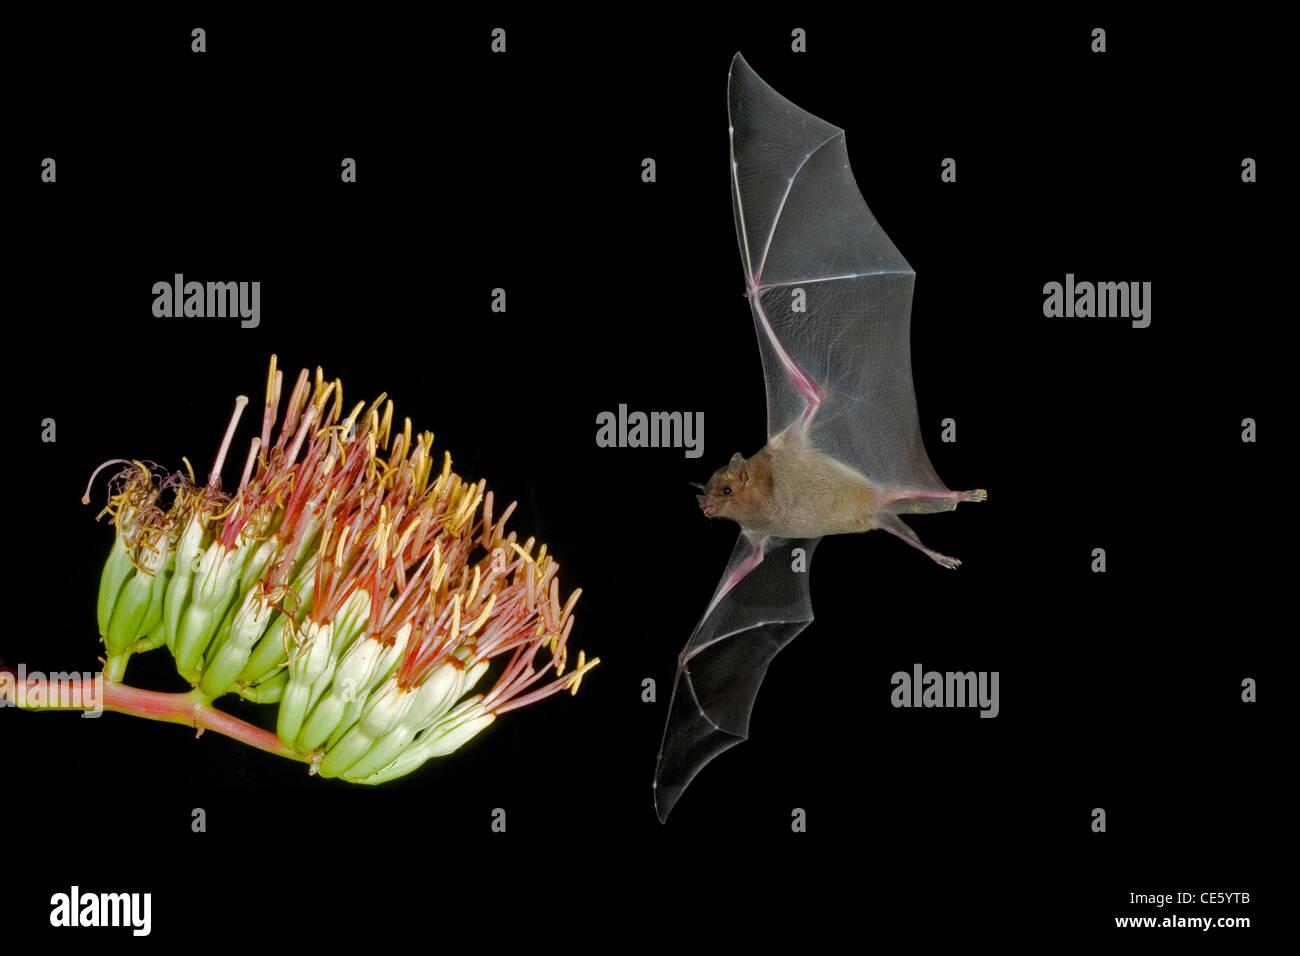 Lesser Long-nosed Bat Leptonycteris curasoae Amado, ARIZONA, United States 23 August Adult at Parry's Agave - Stock Image